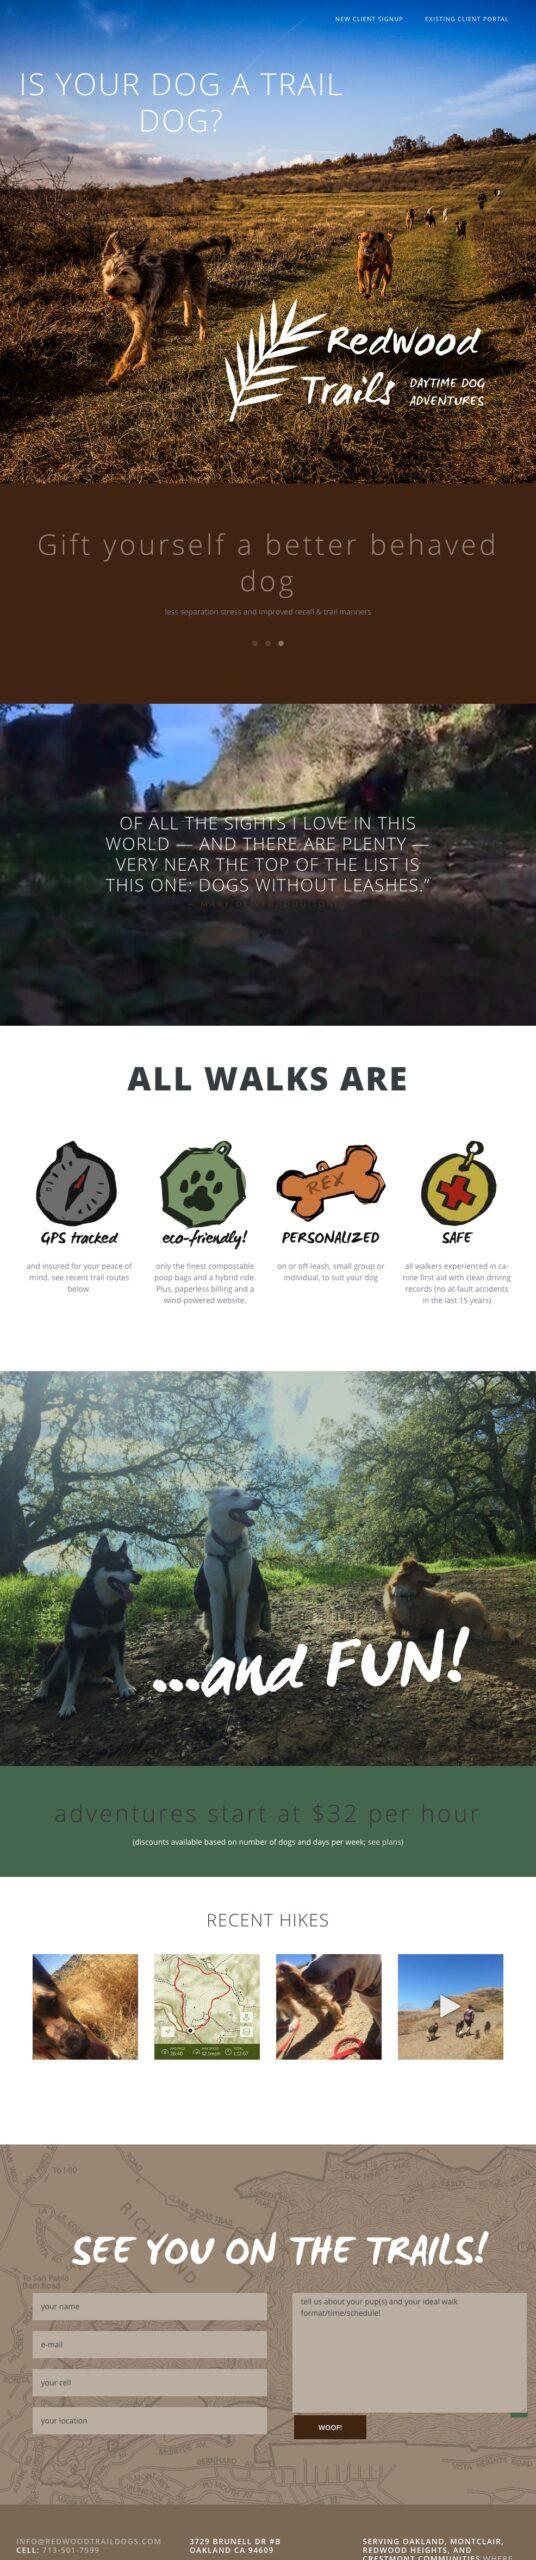 webdesign redwoodtraildogs scaled